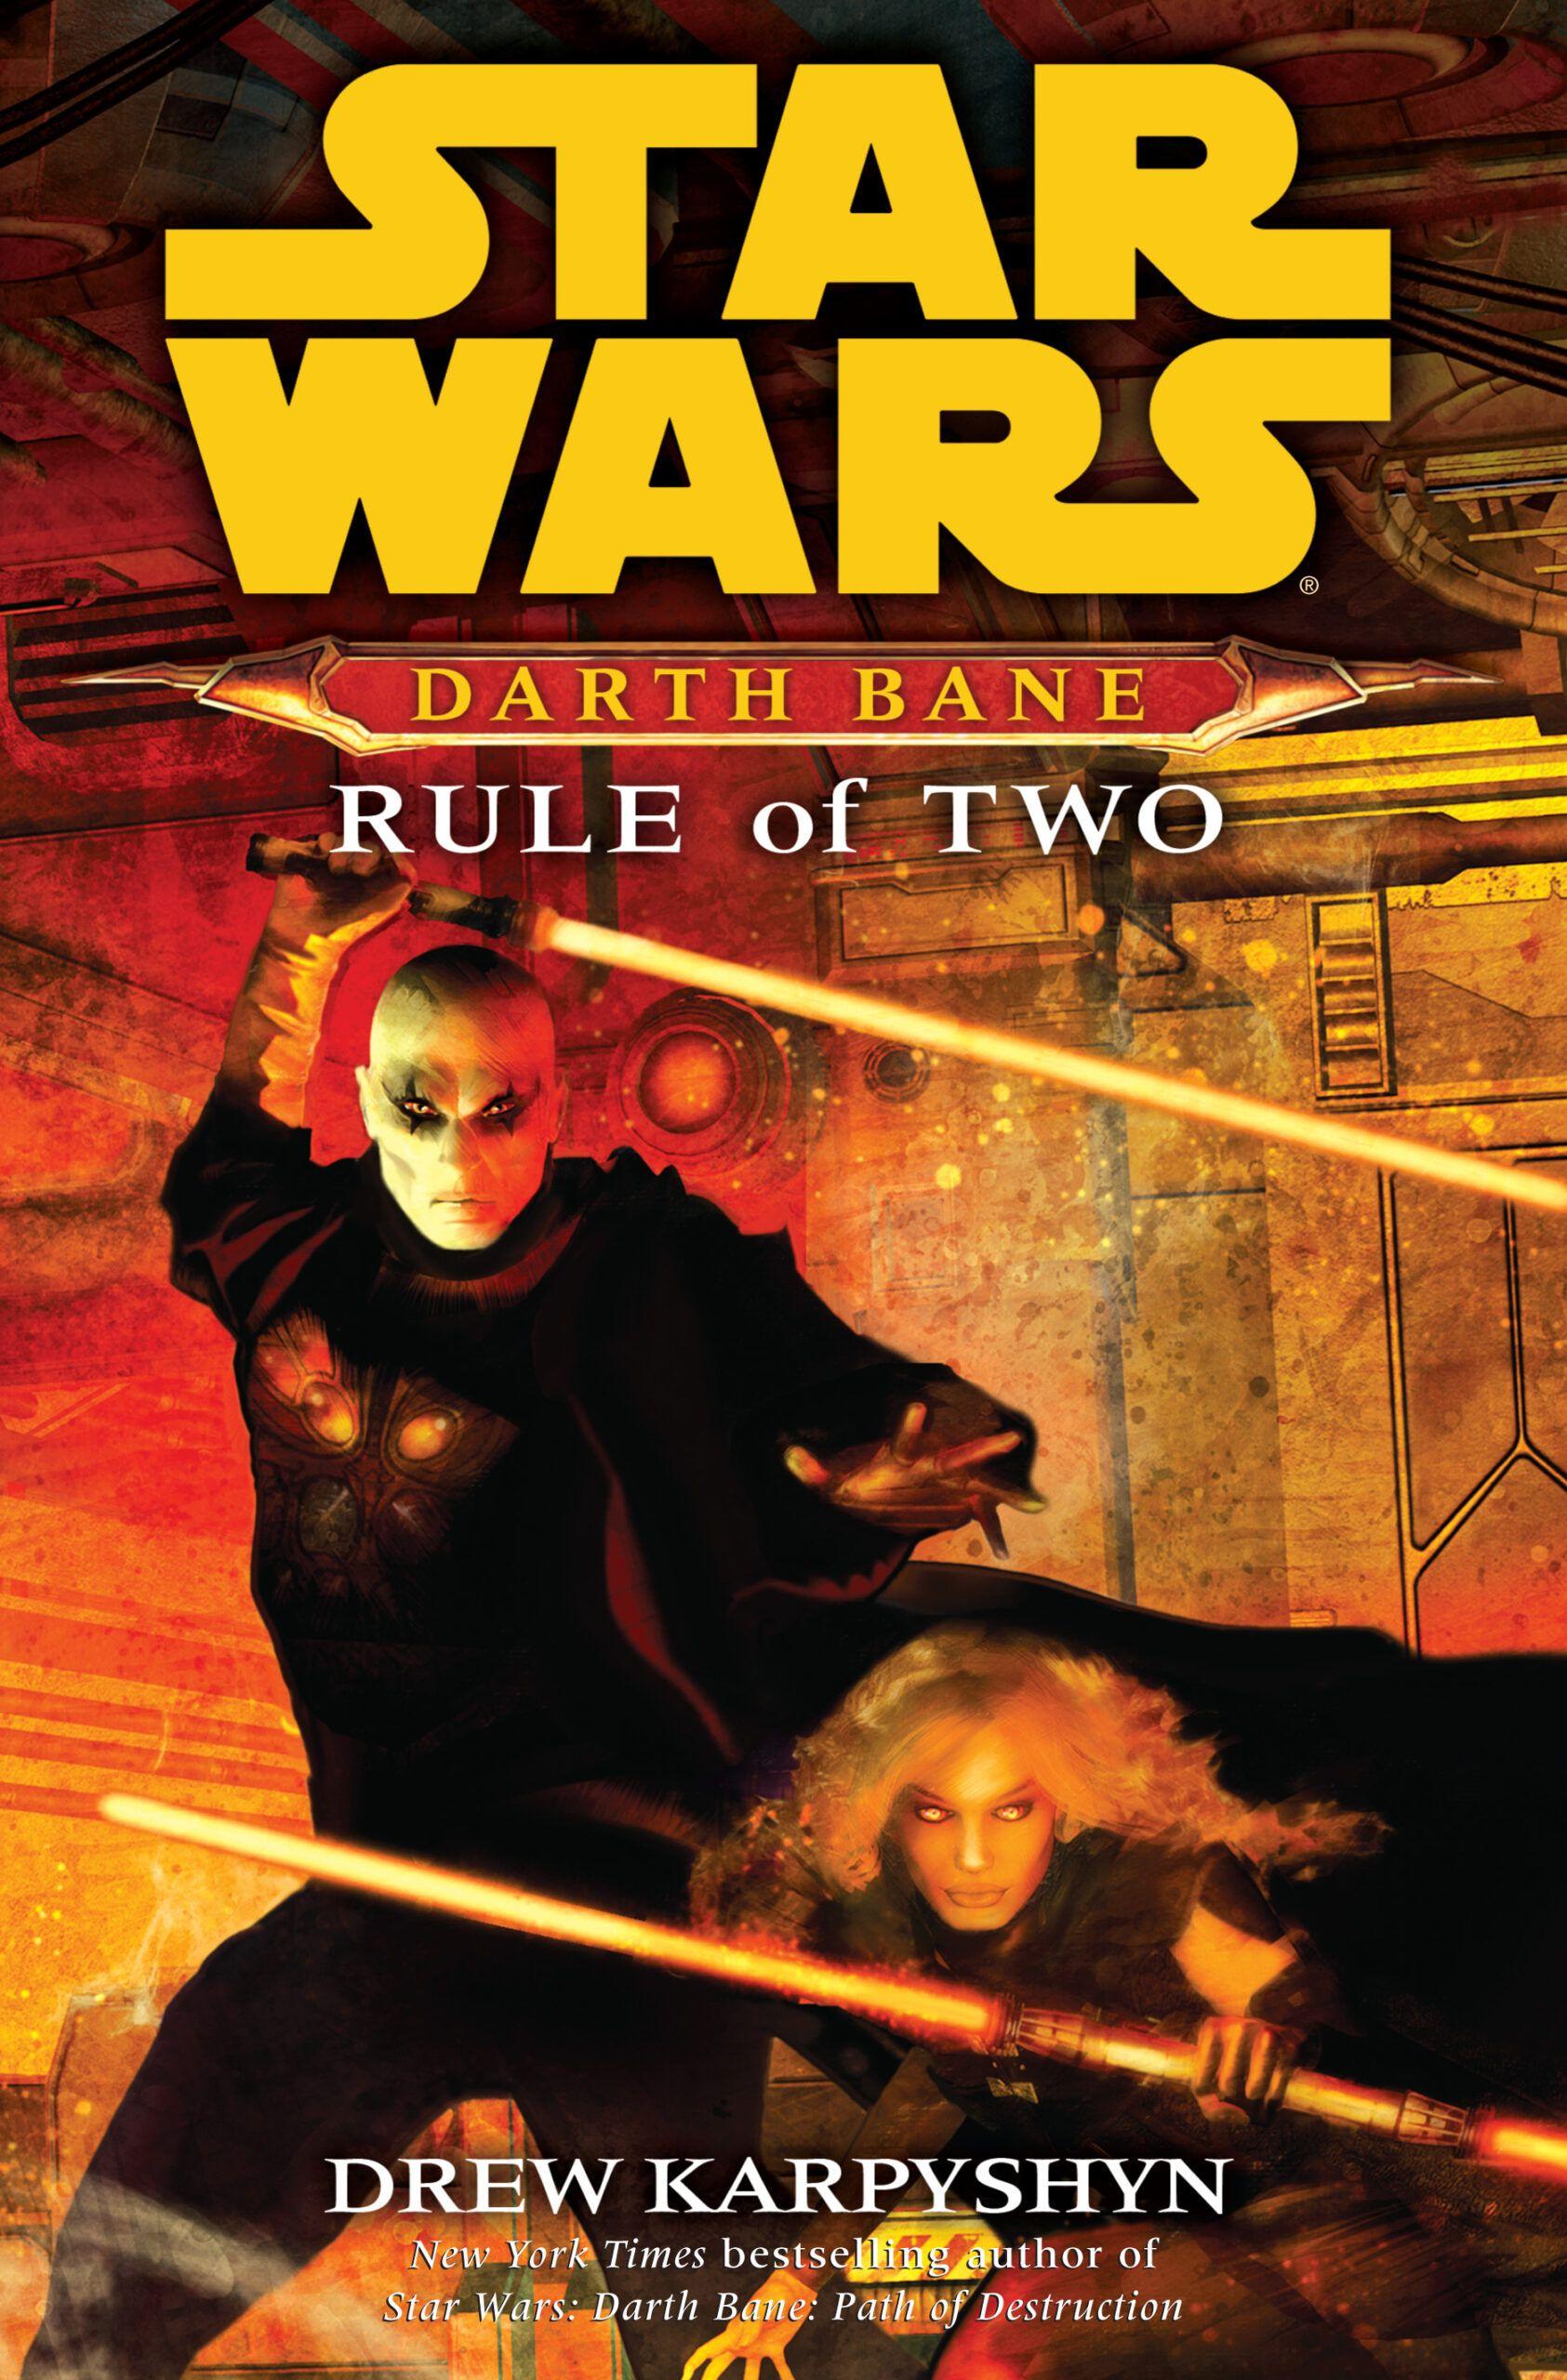 Darth bane rule of two darth bane bane star wars